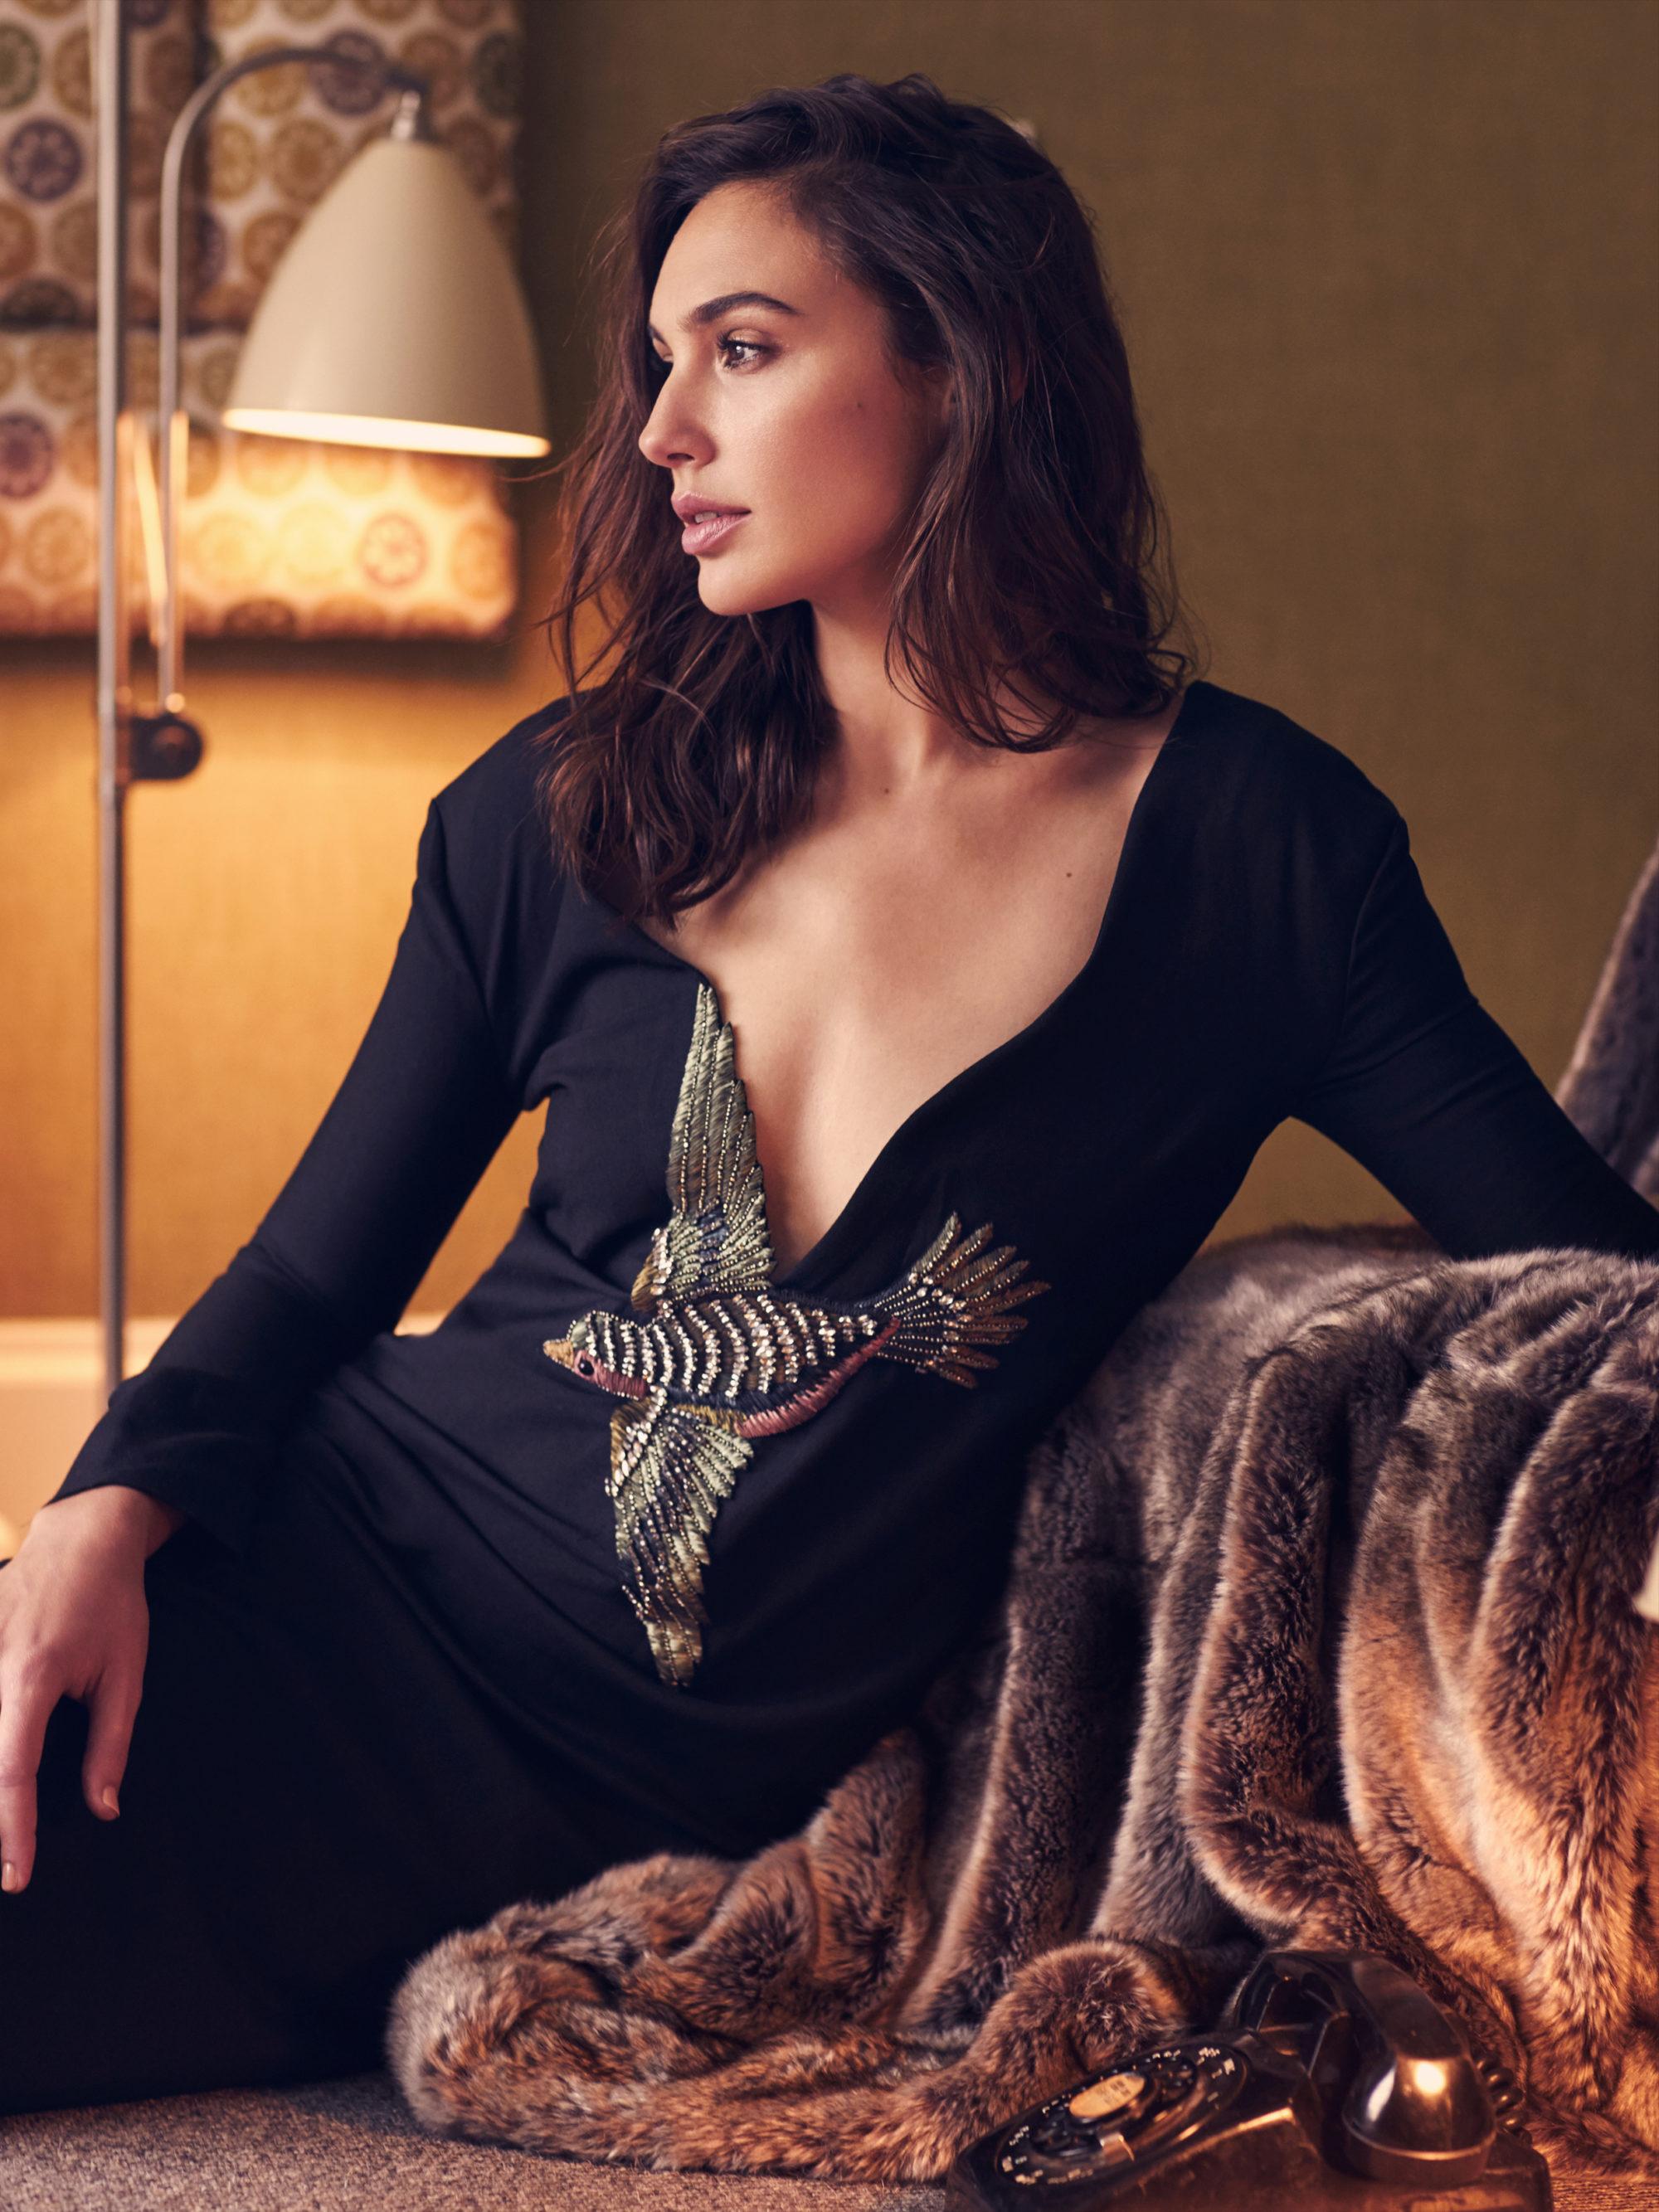 Marian Sell Vogue Russia Gal Gadot 01 B